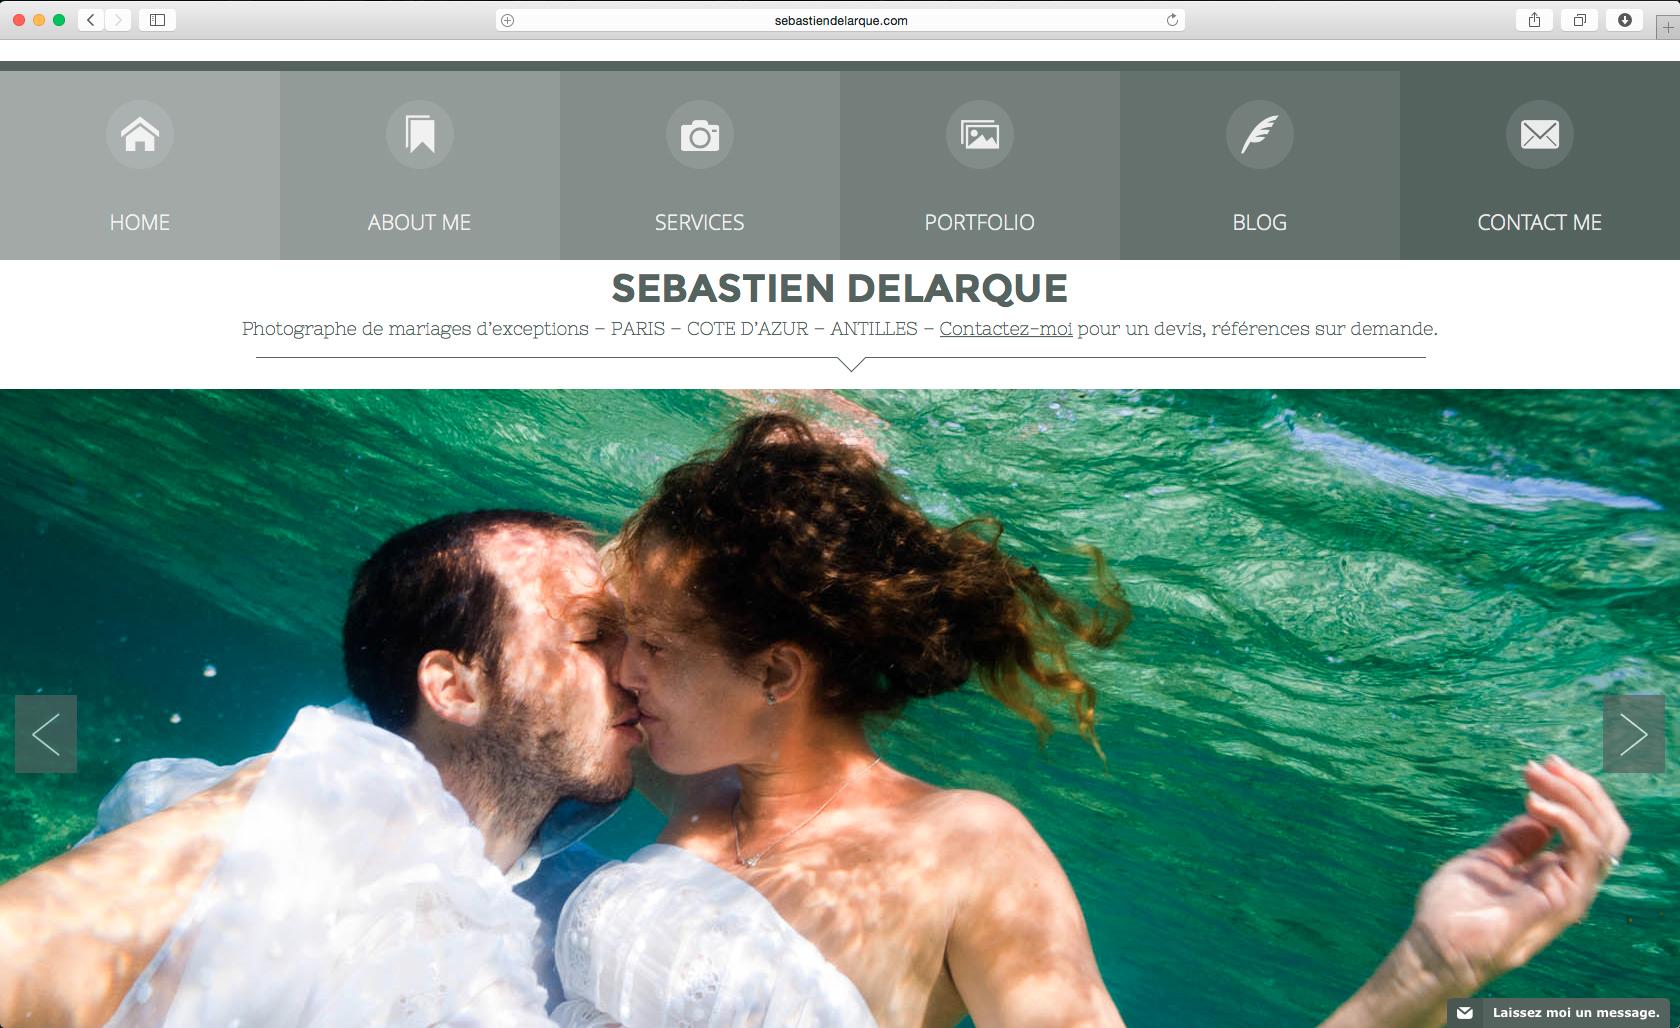 Accueil du site de Sébastien Delarque